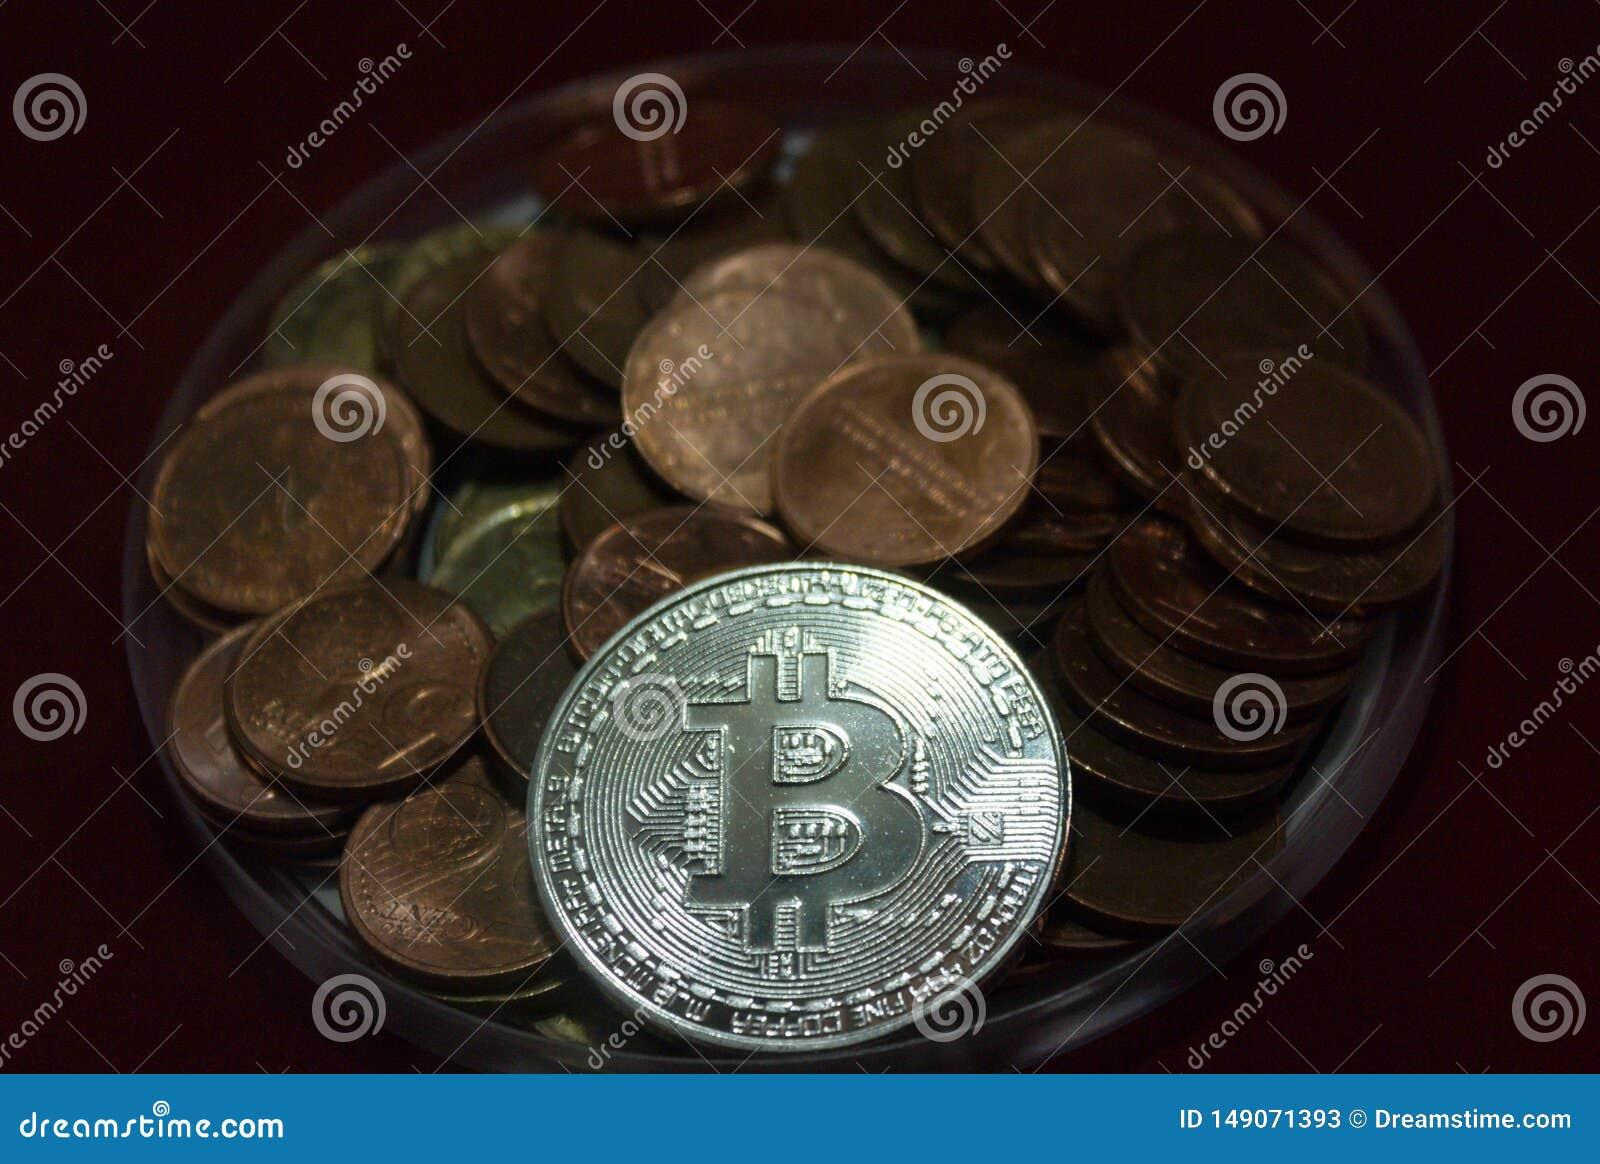 Closeup of a bitcoin